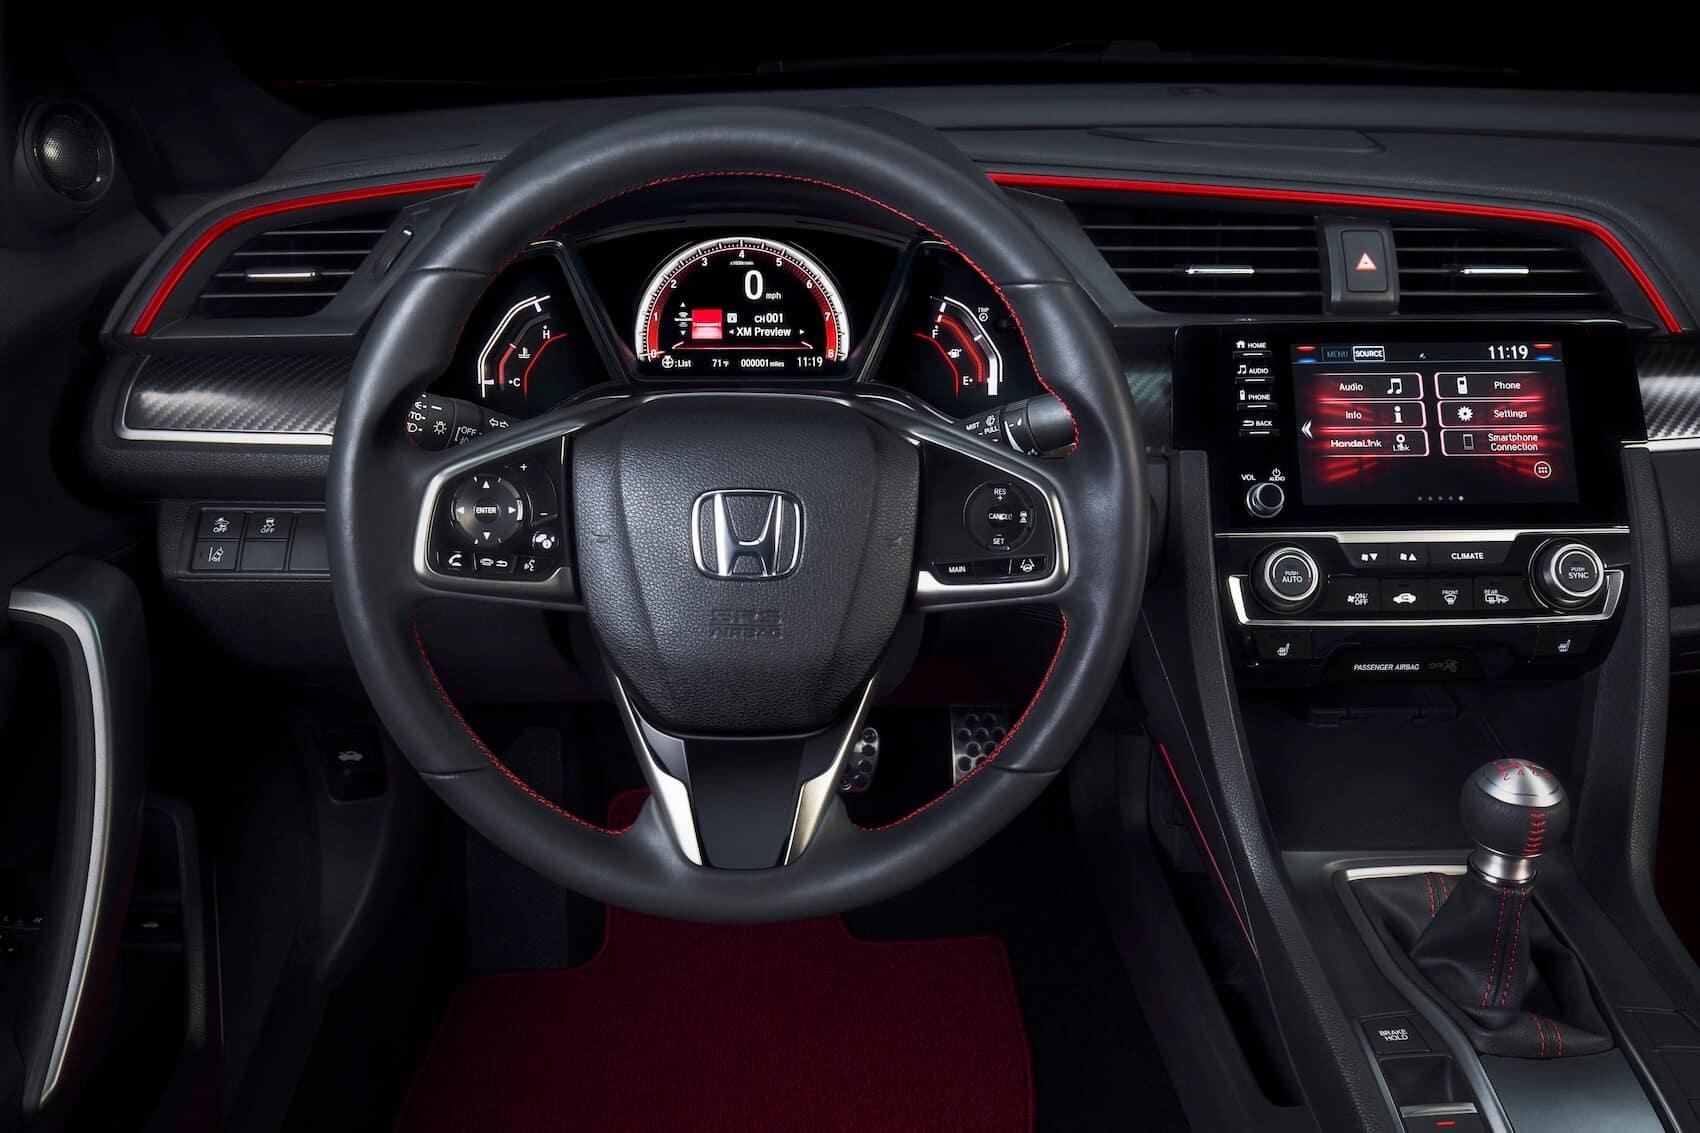 Honda Civic Interior: Technology